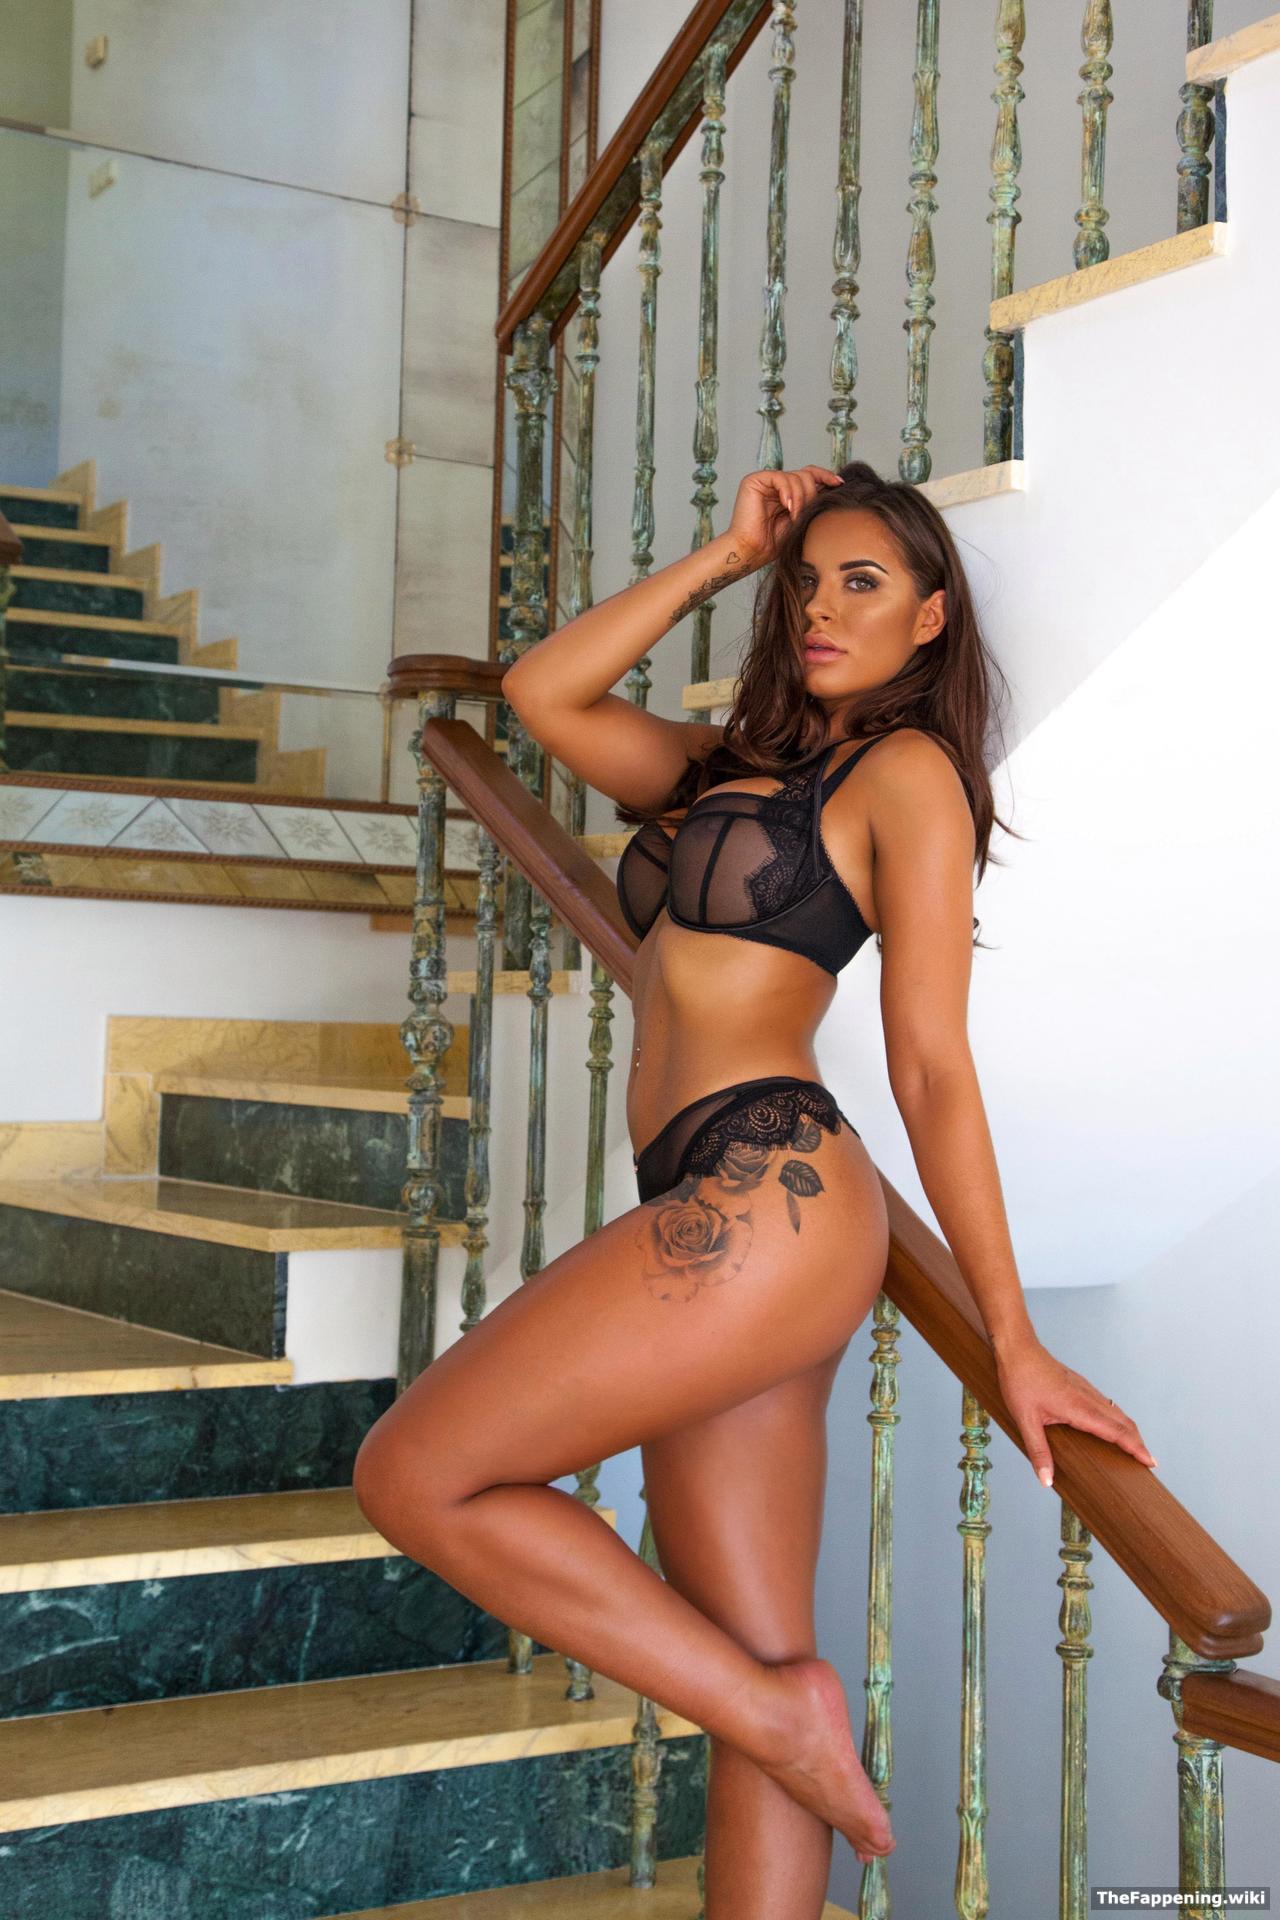 nude (45 photos), Hot Celebrity pics